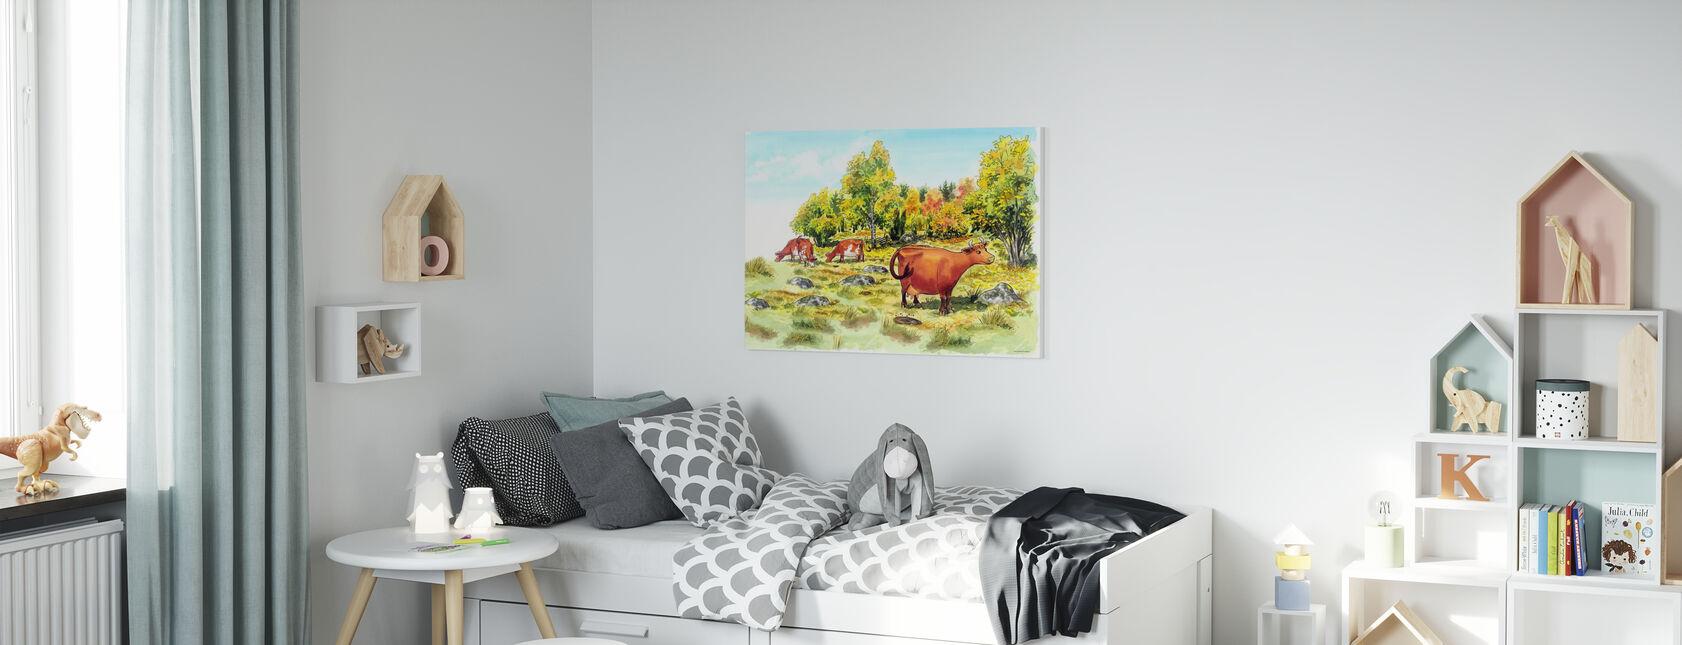 Maman Mu & Corbeau -Maman Mu - Impression sur toile - Chambre des enfants